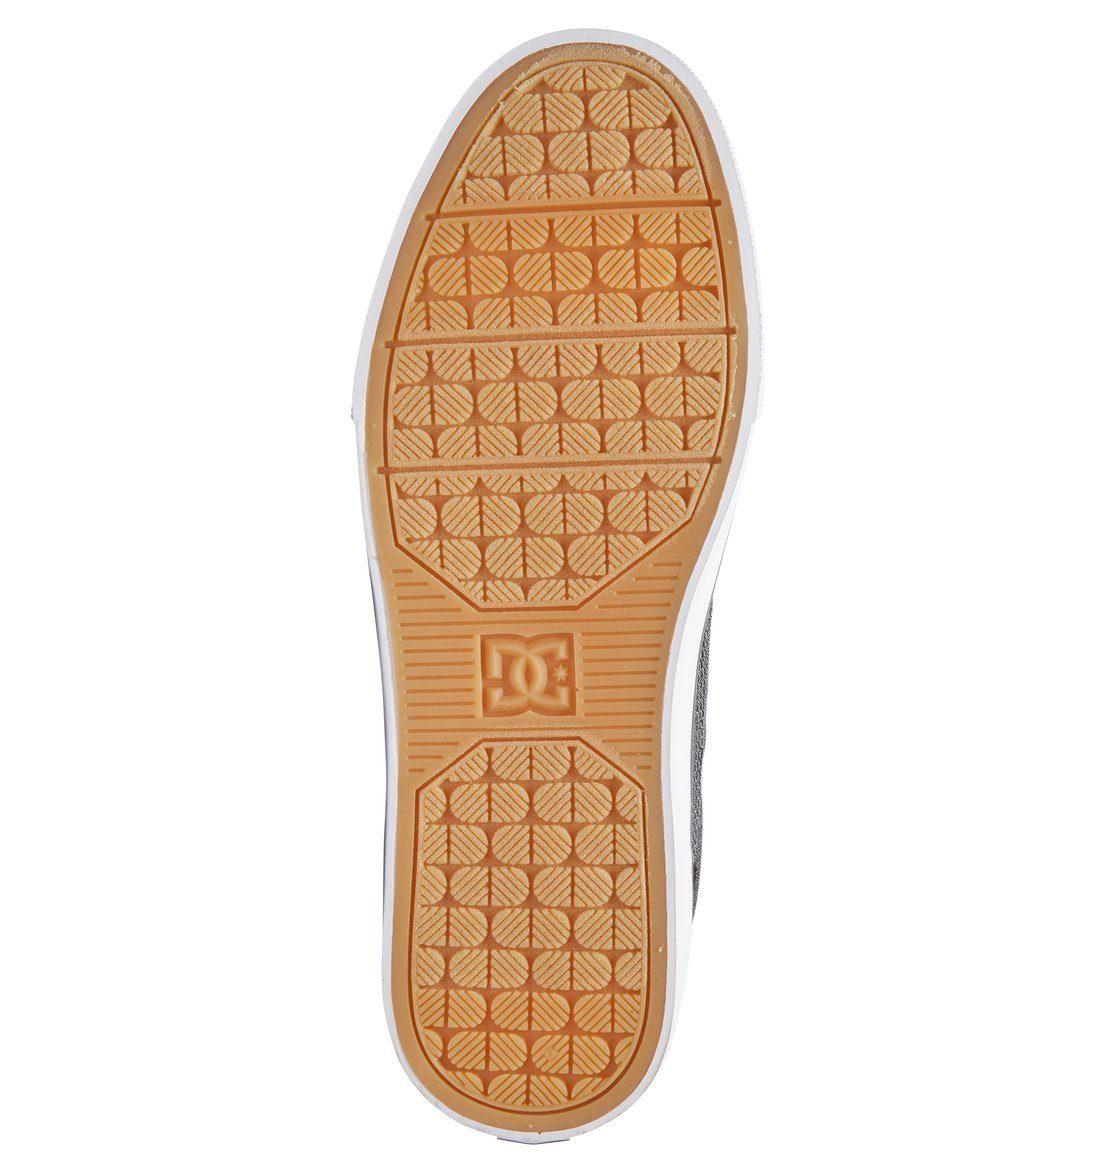 Shoes Artikel Online Dc Schuhe Tx Se 6862720399 Spezial Orange nr Kaufen Grey textilobermaterial Tonik zqSdAUq